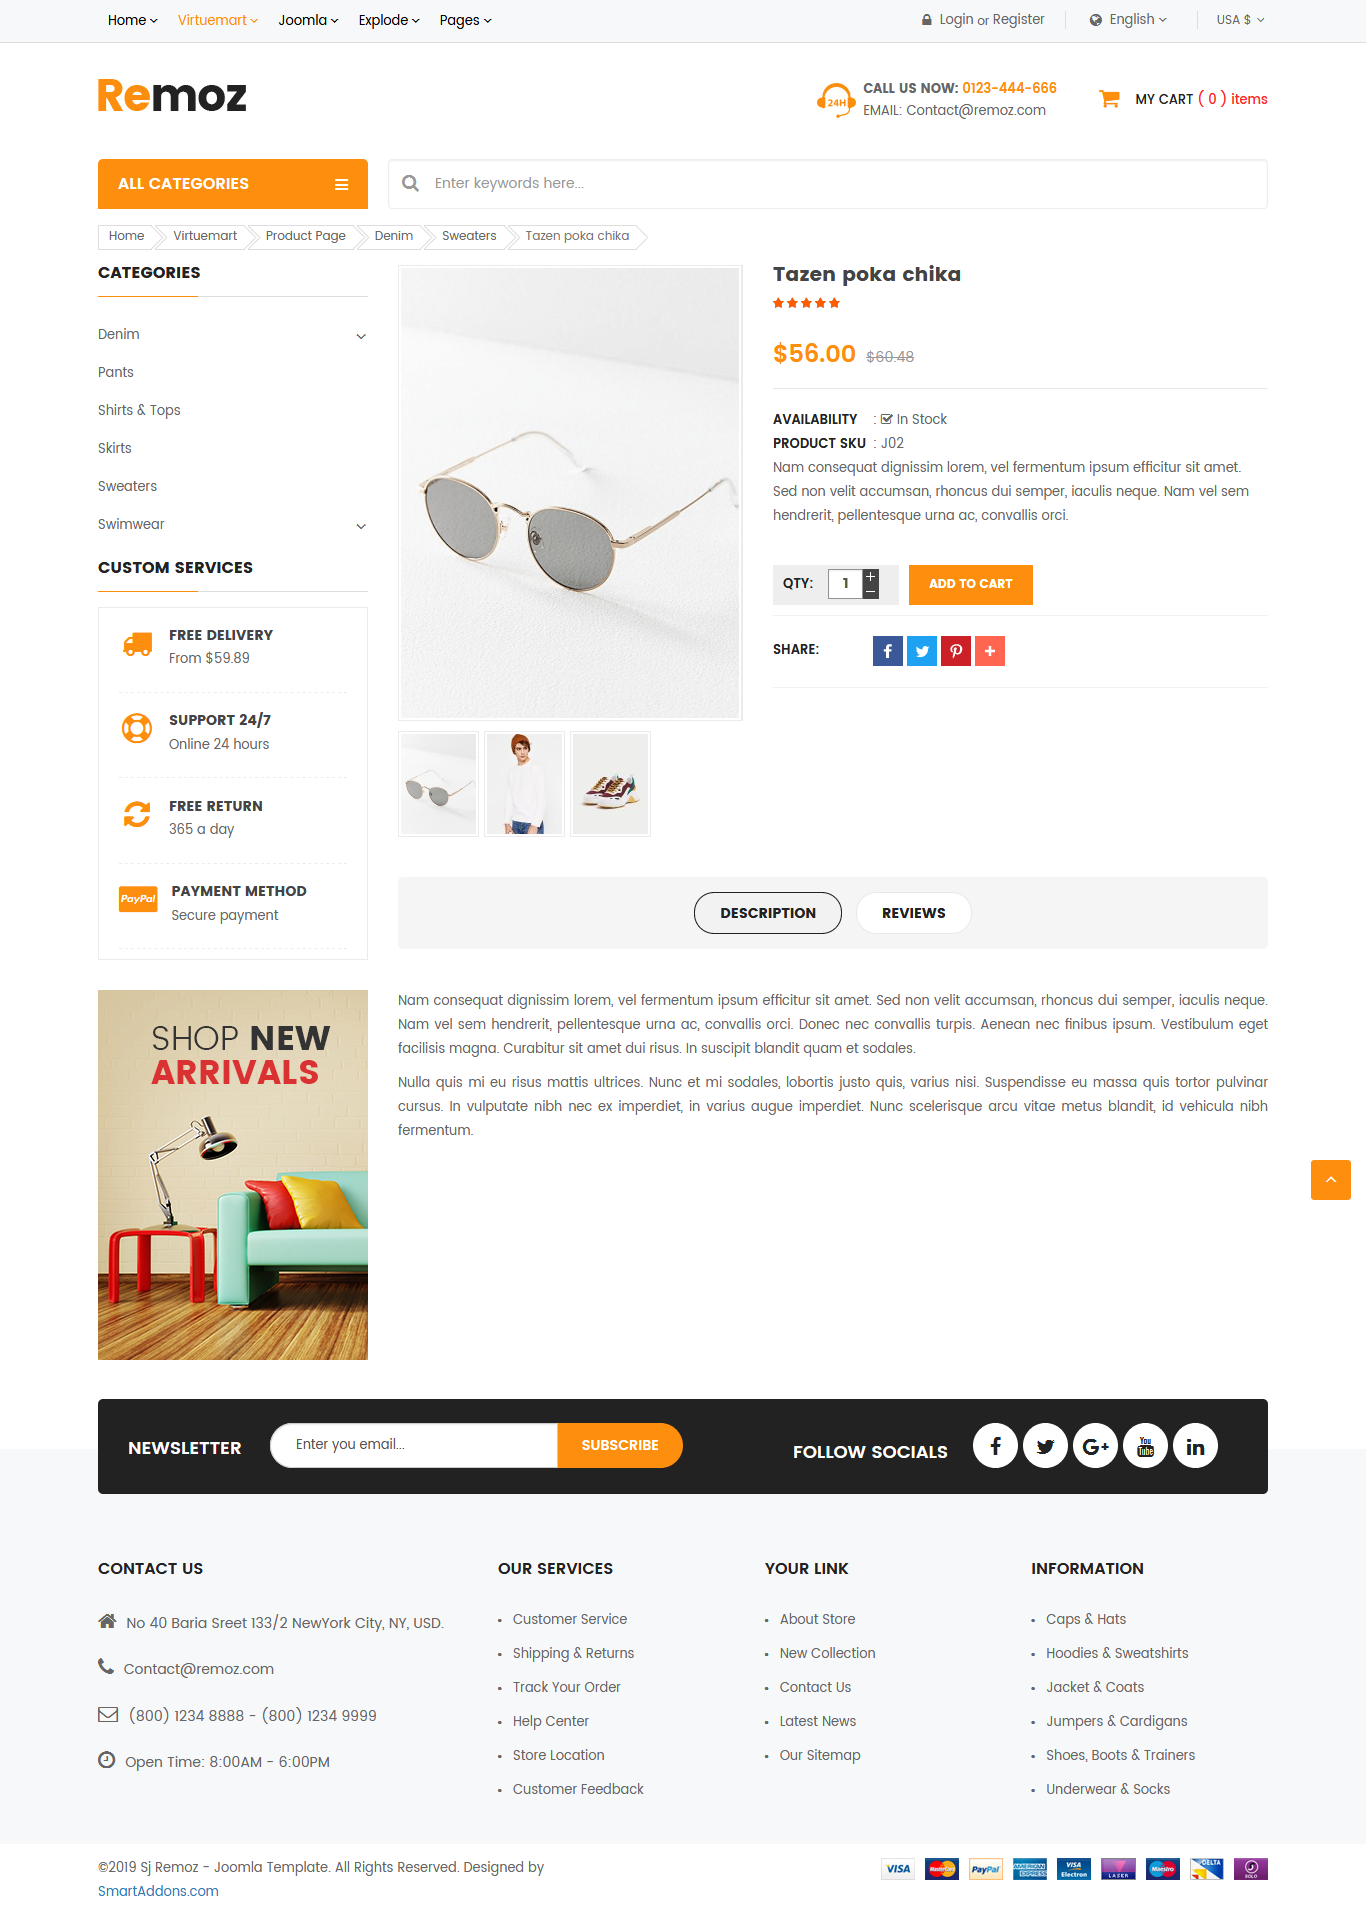 Free VirtueMart Joomla Template Sj Remoz in 2020